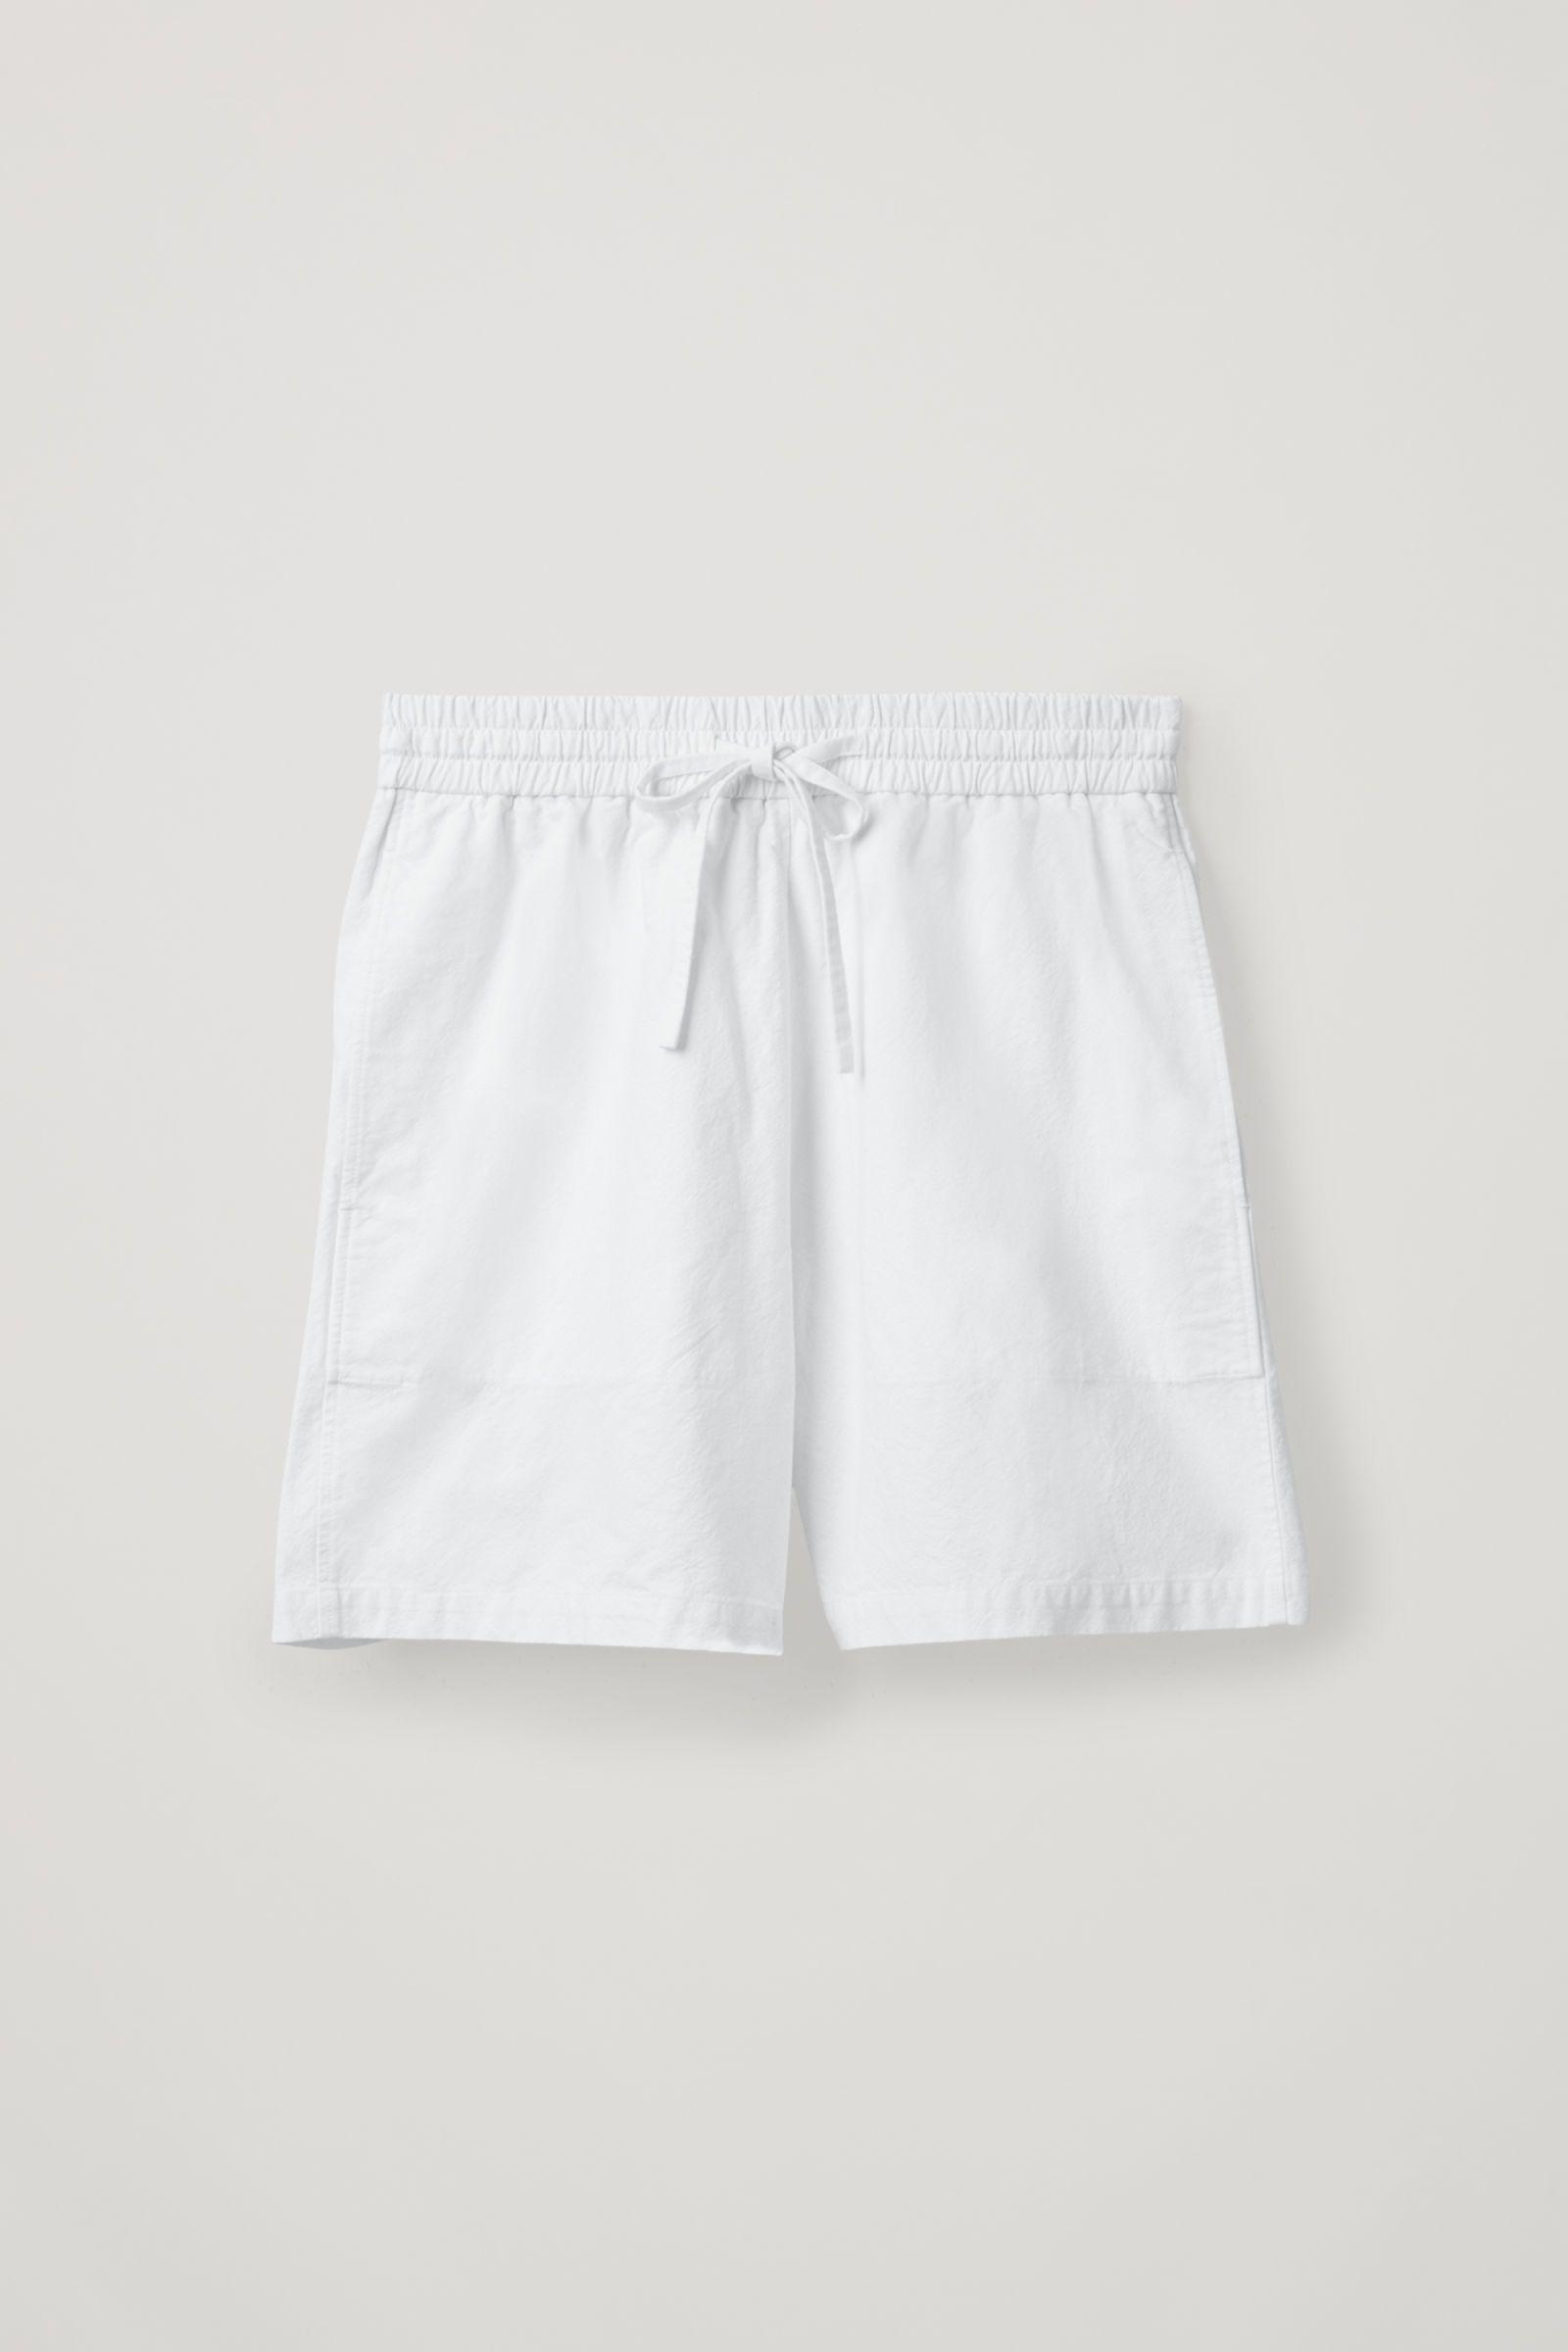 15 Best Shorts for Men 2020 - Shorts